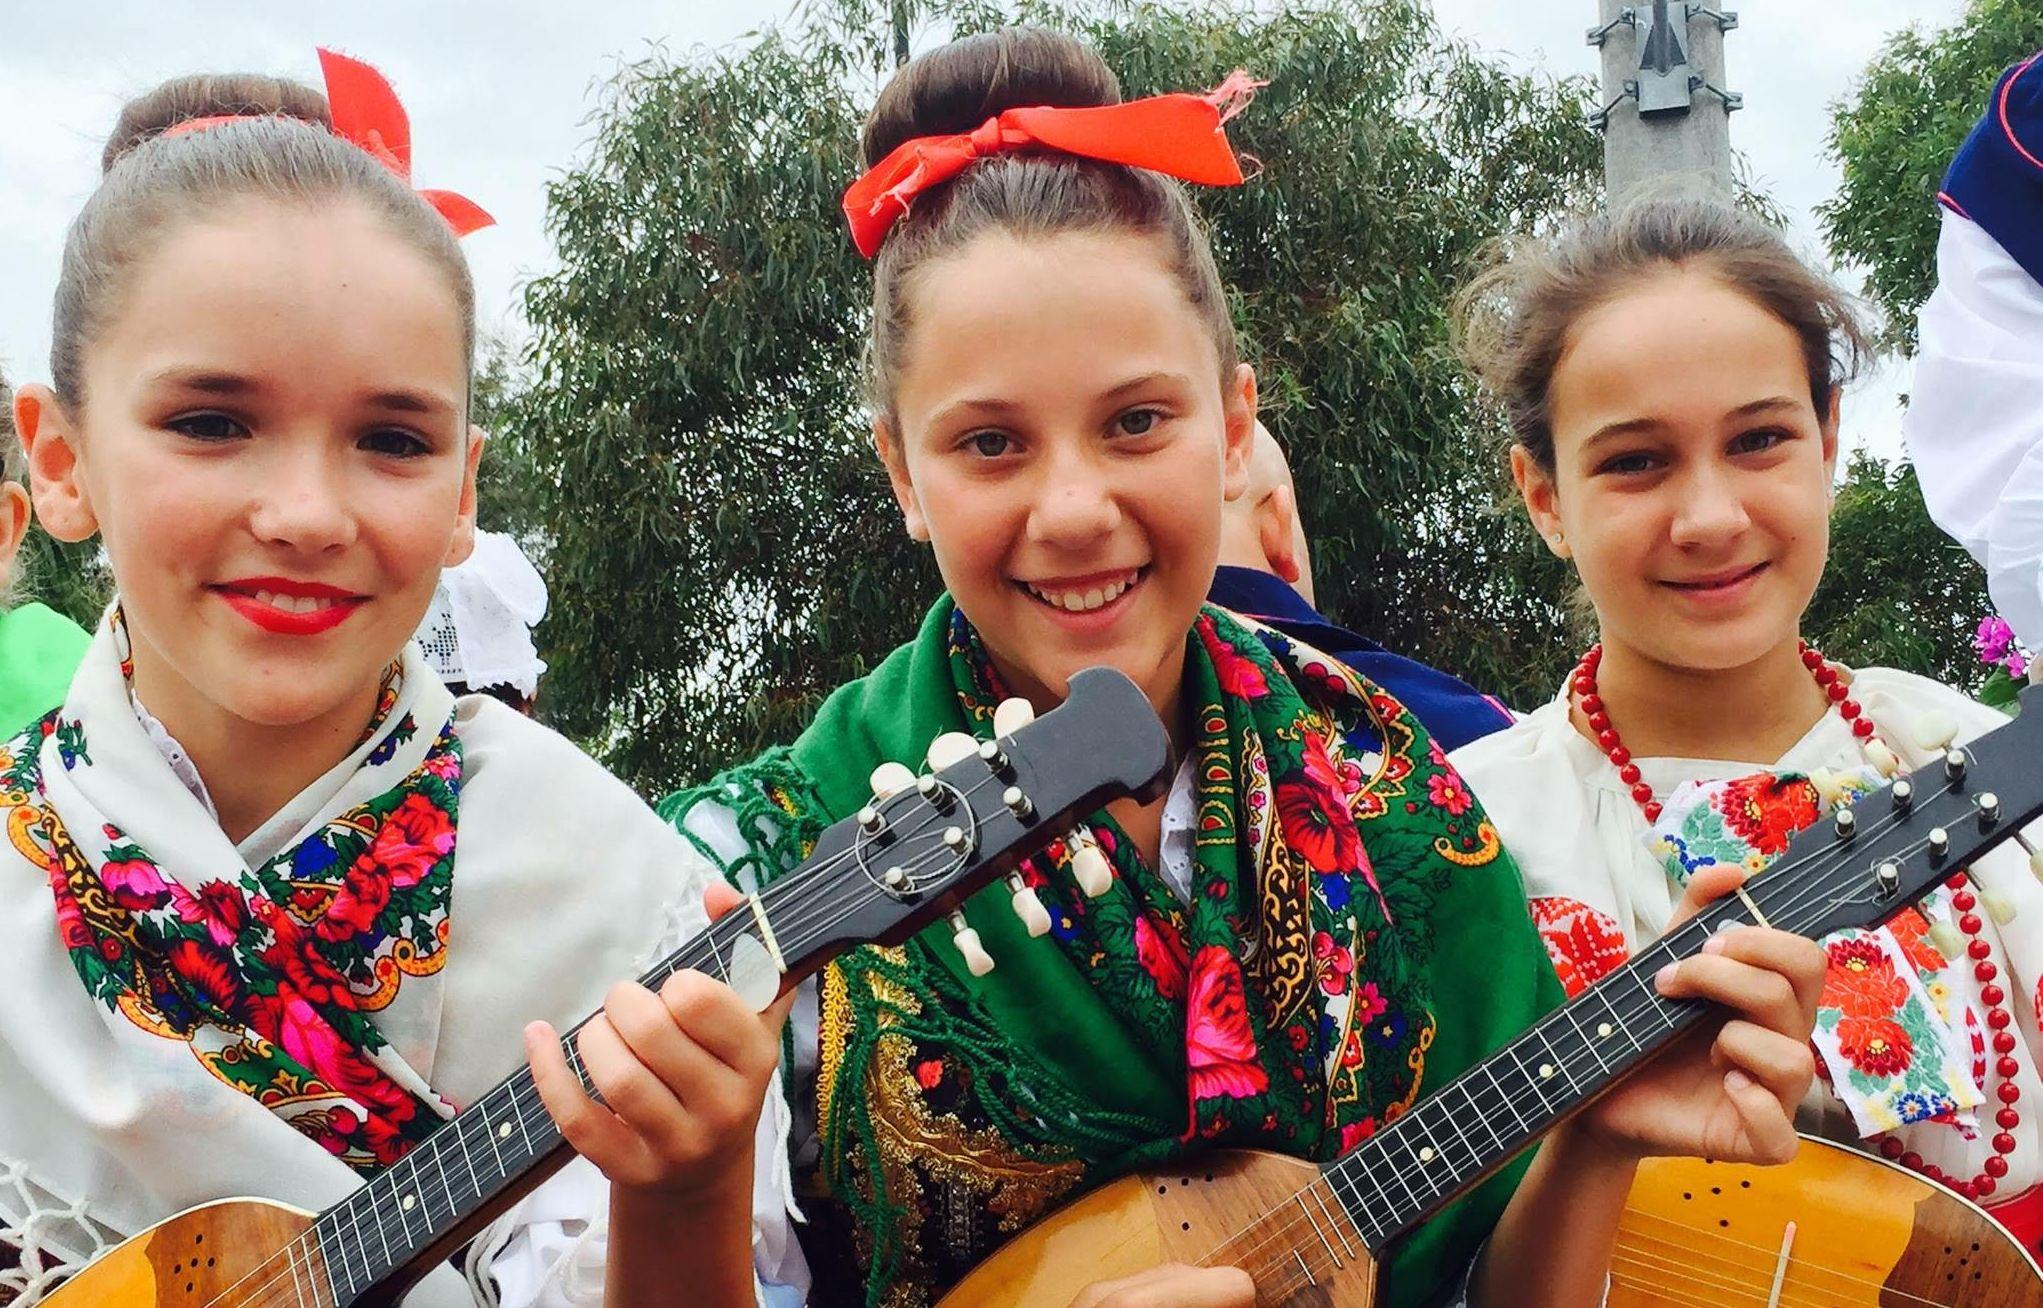 Keeping Croatian Traditions Alive 15,000 km Away